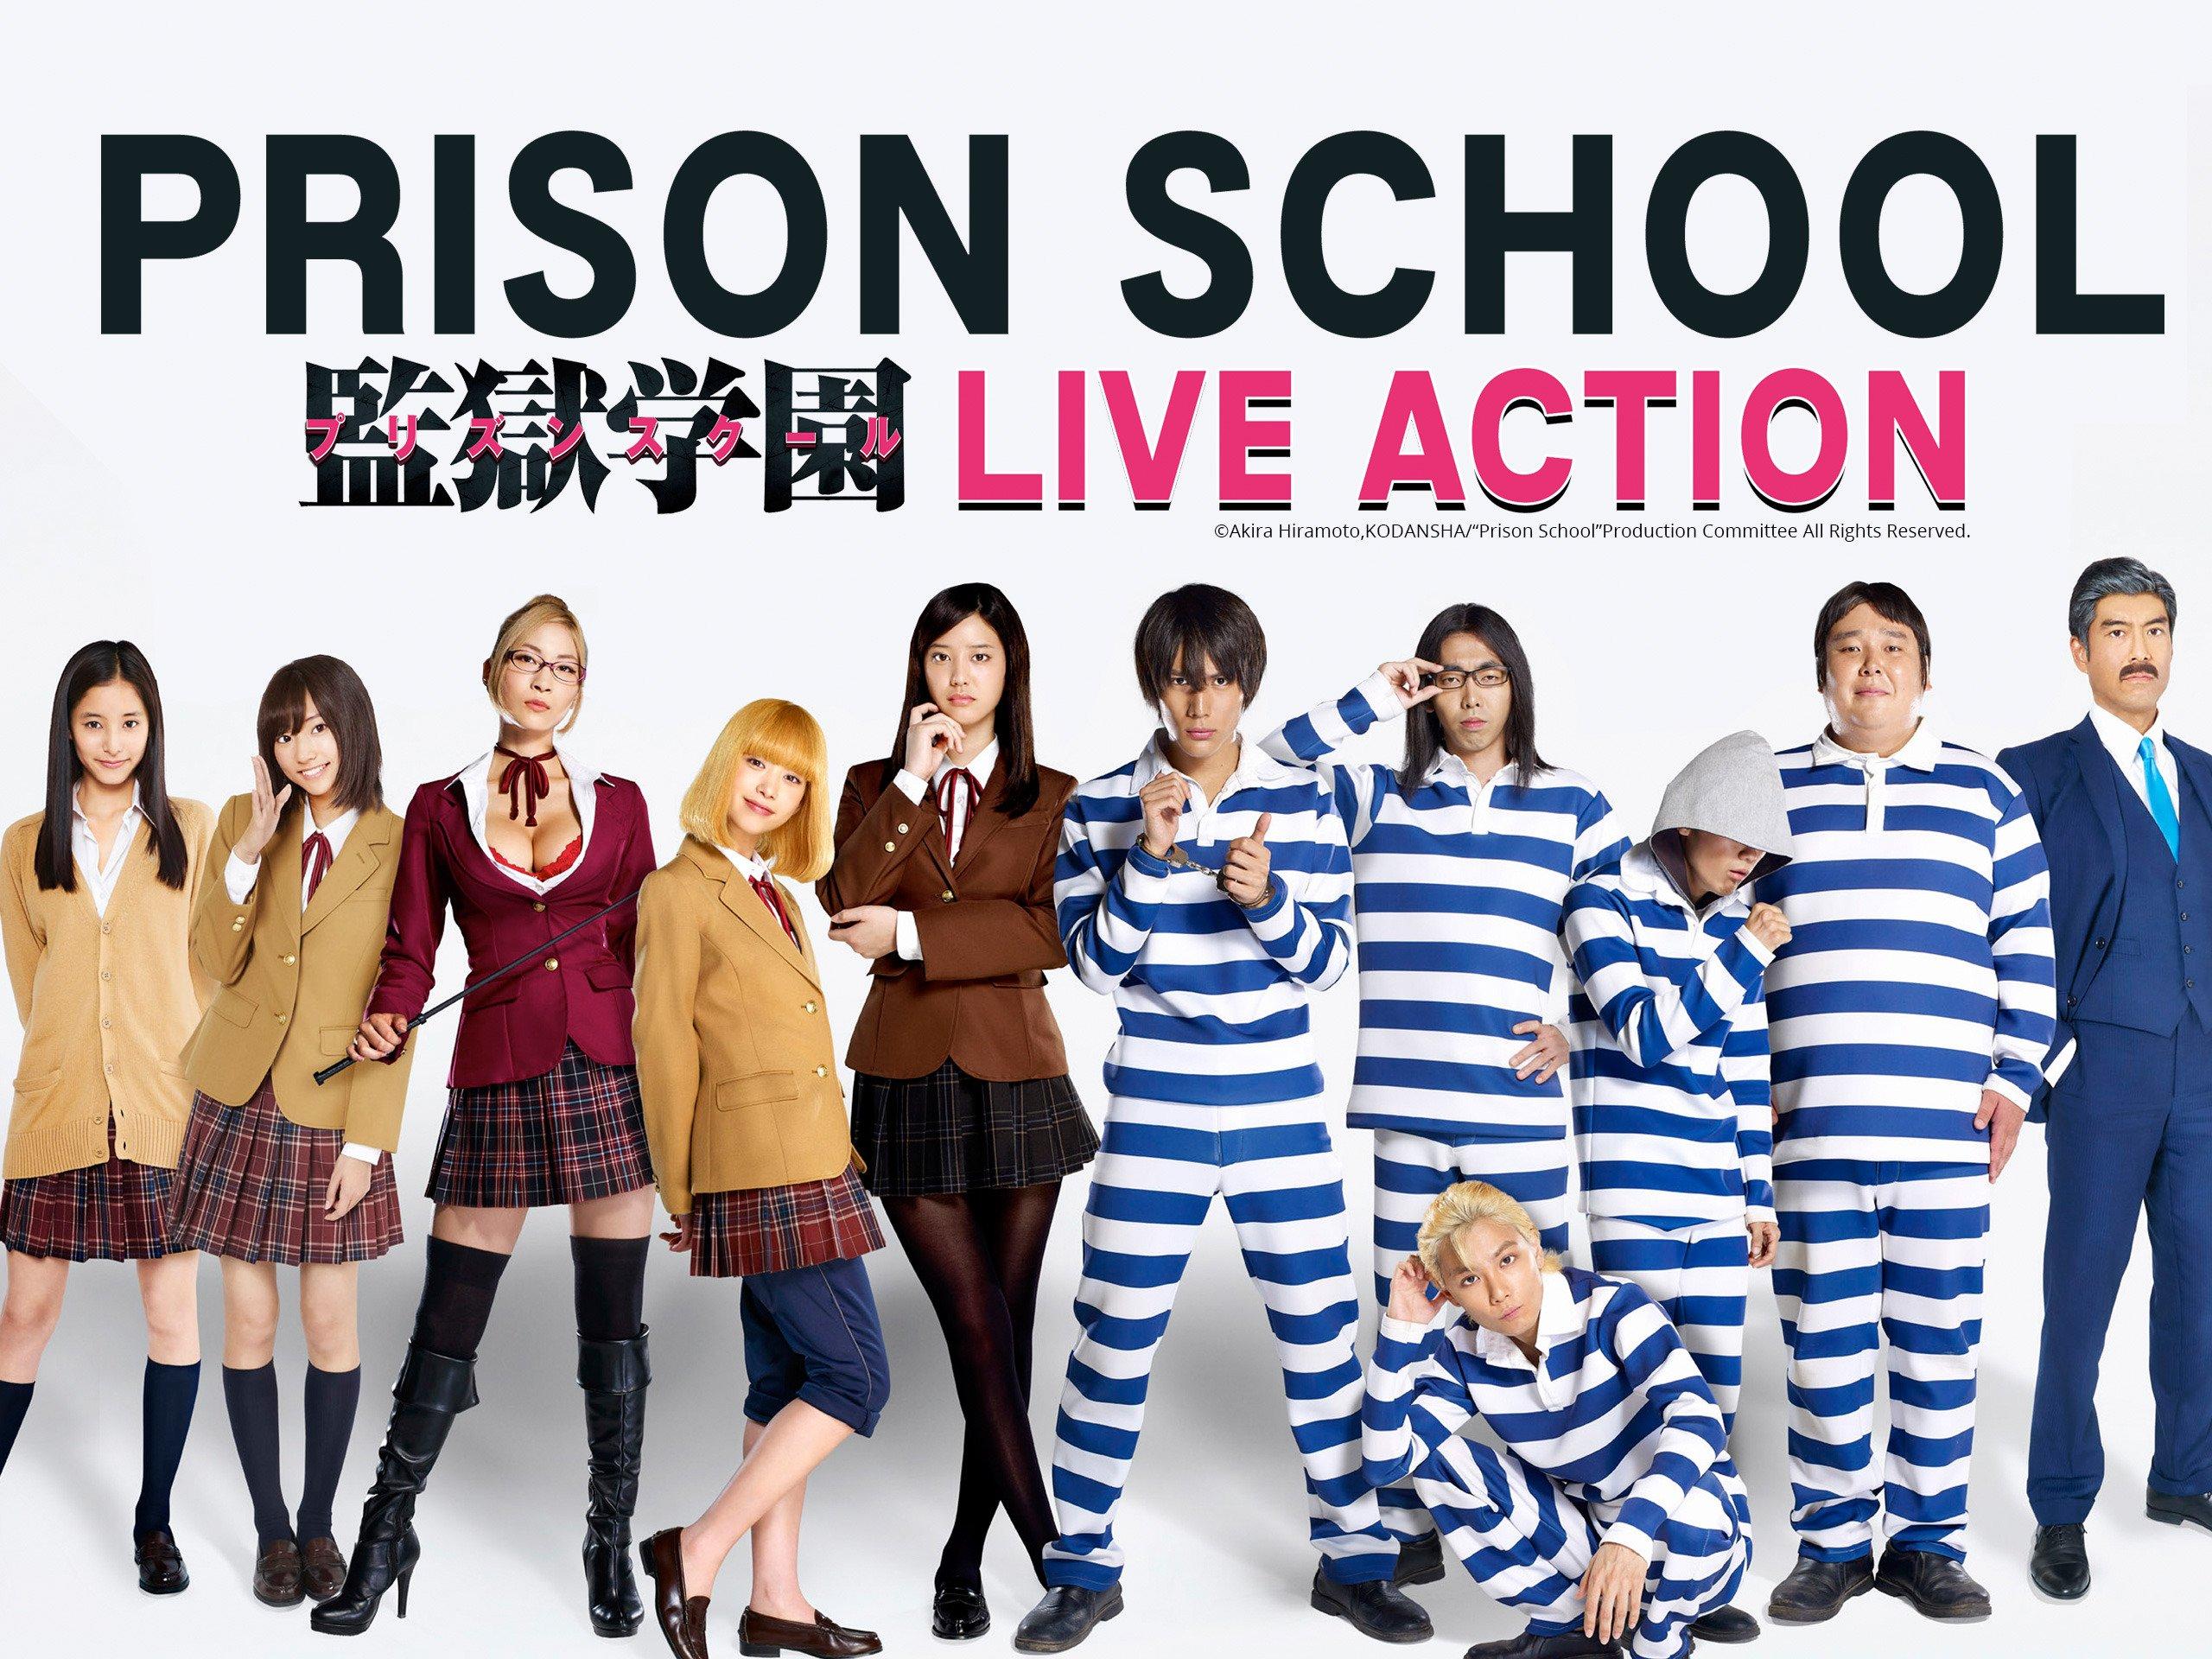 Amazon.com: Watch Prison School: Live Action (Original ...